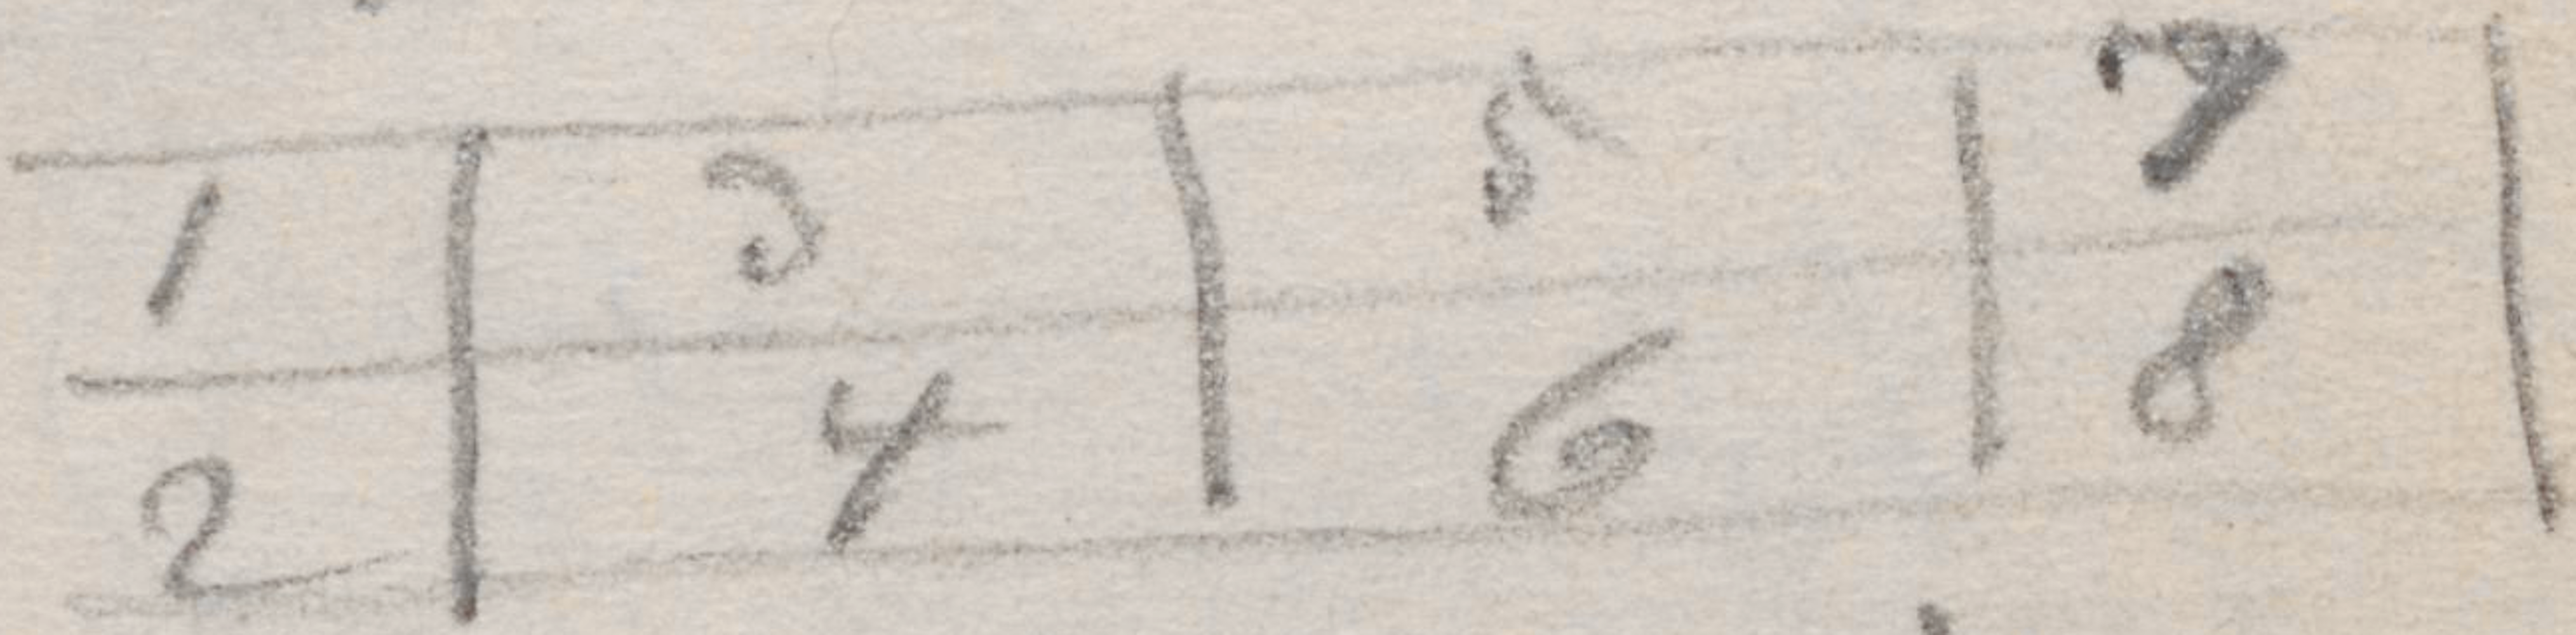 Gemäldekomposition; Szenen aus dem Alten Testament [Freskenzyklus]SzenenausdemAltenTestament[Freskenzyklus]falseetwa 1420etwa 1497ital. MalerGozzoliBenozzoGozzoli, BenozzoFresken mit Szenen aus dem Alten Testament.